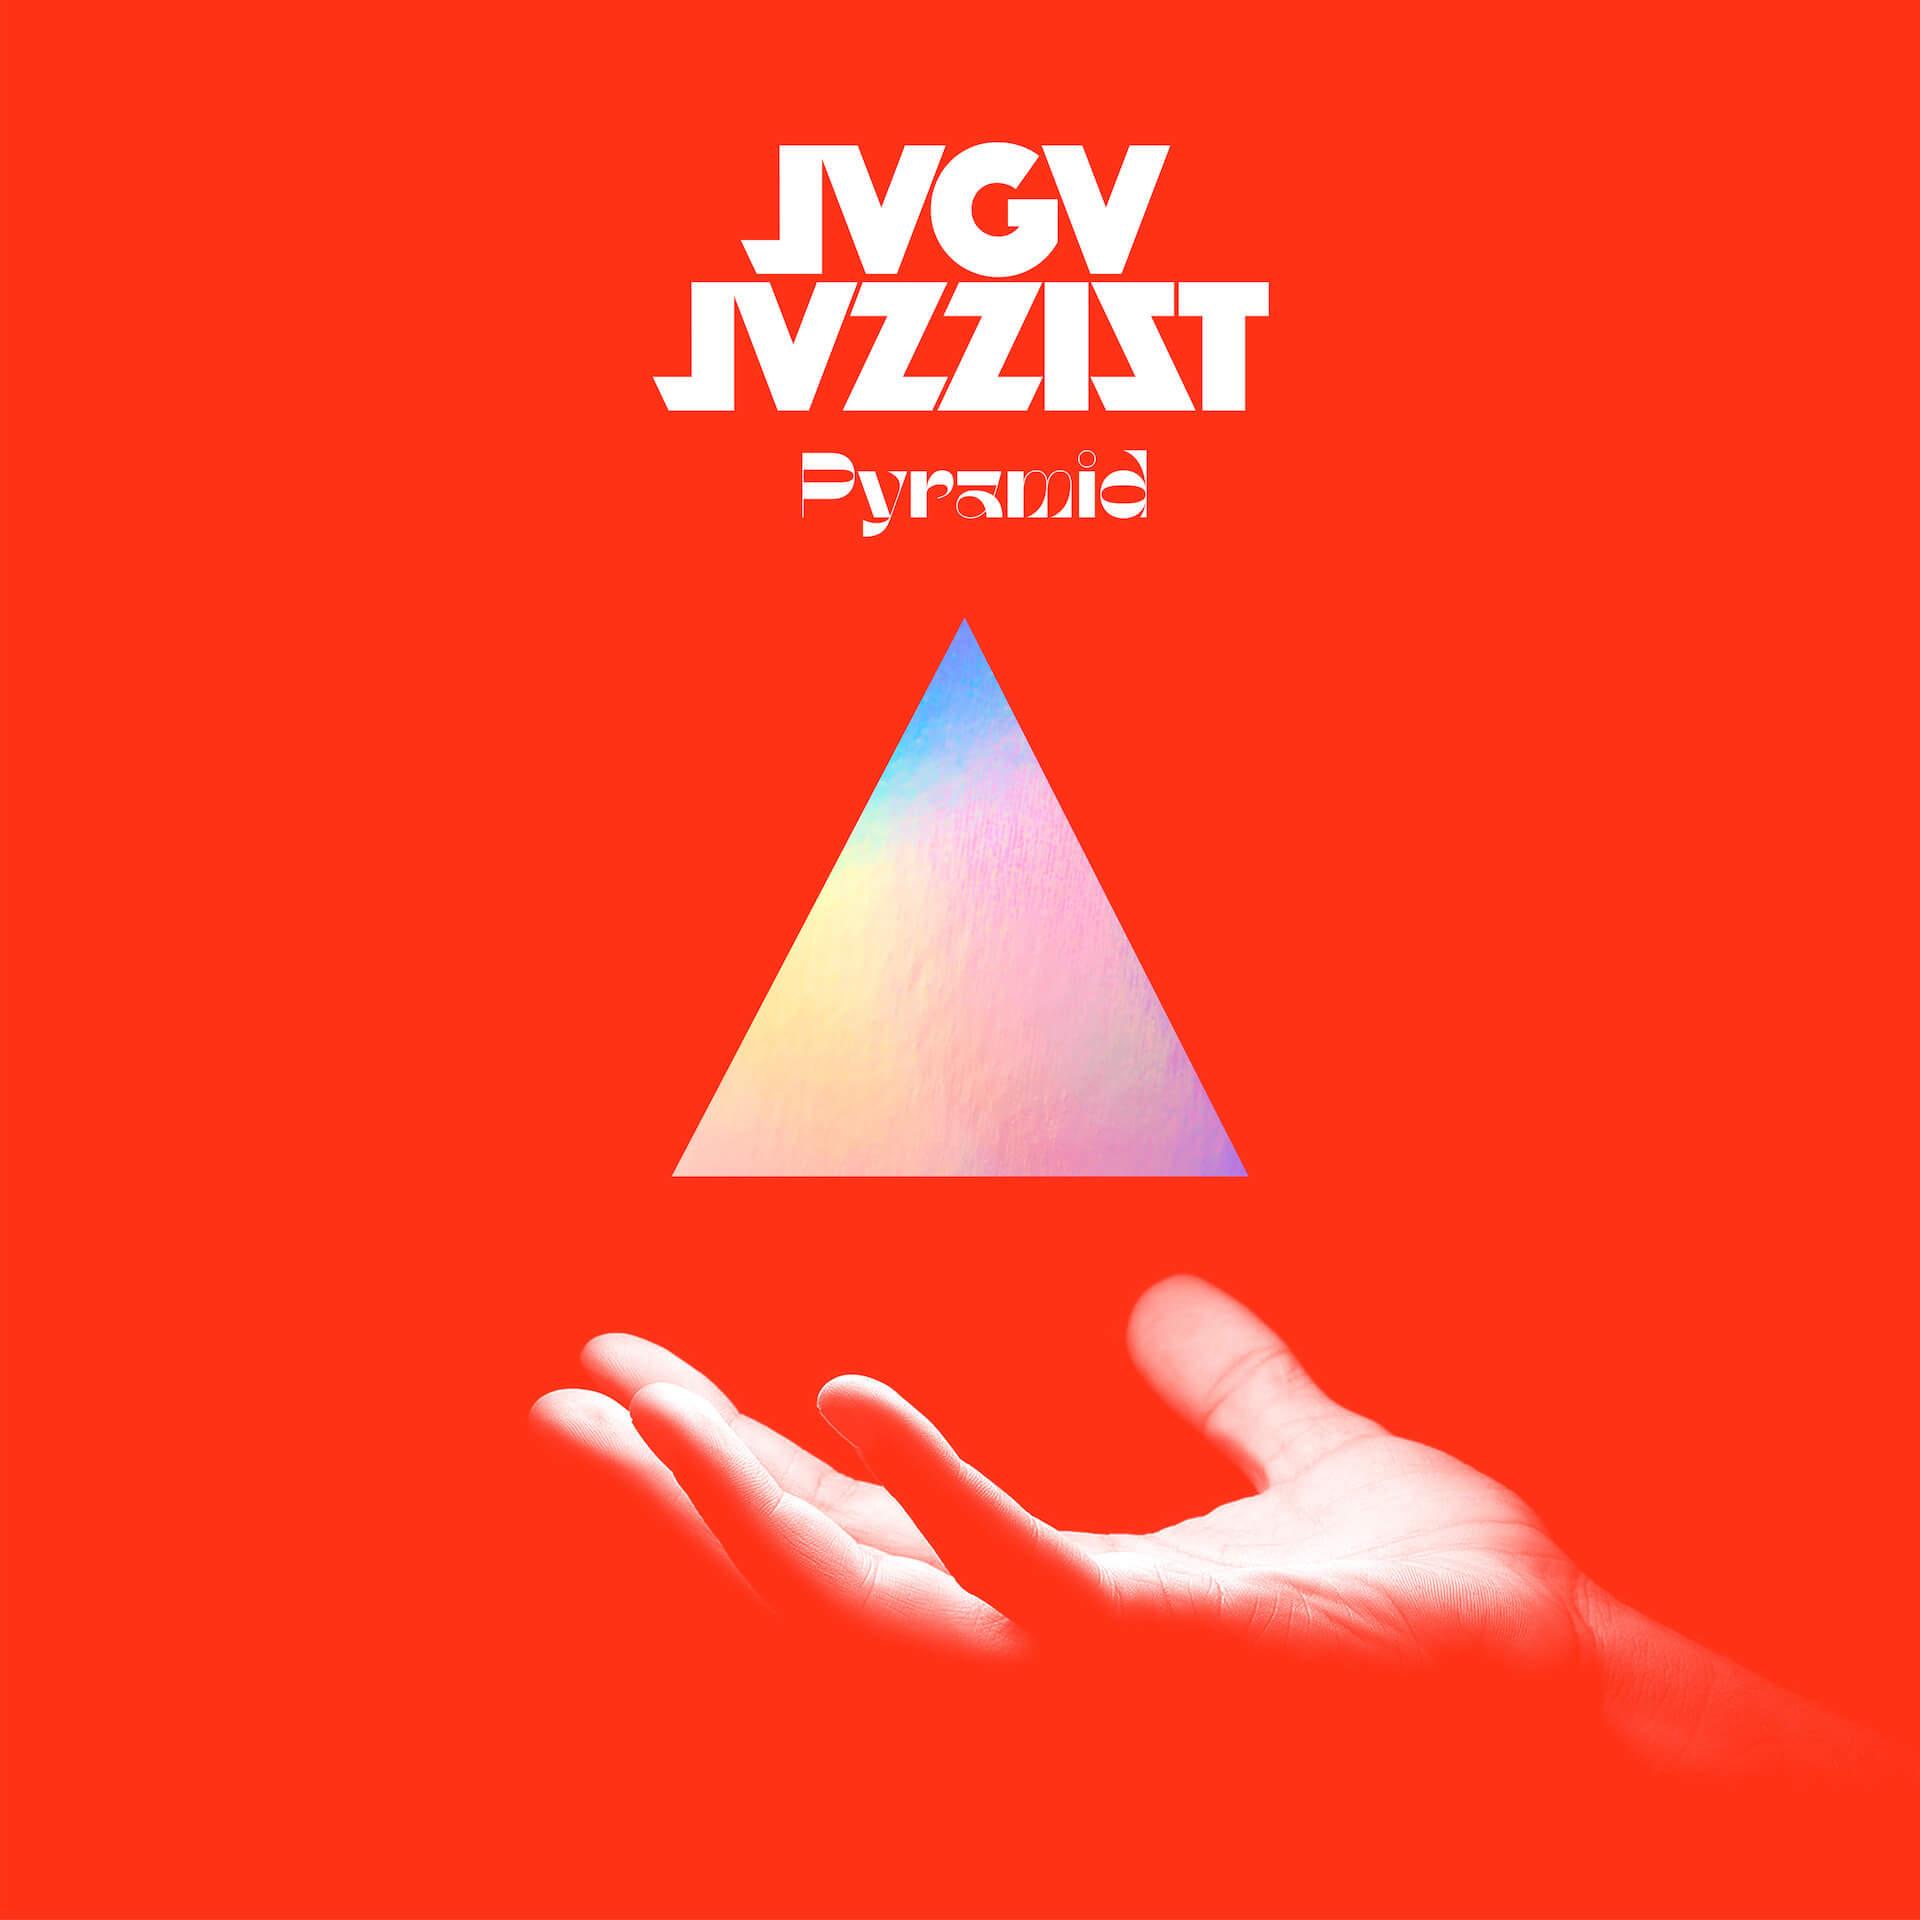 JAGA JAZZISTが〈Brainfeeder〉からリリースする作品『Pyramid』日本盤CDにボーナストラック収録決定! music200416_jagajazzist_01